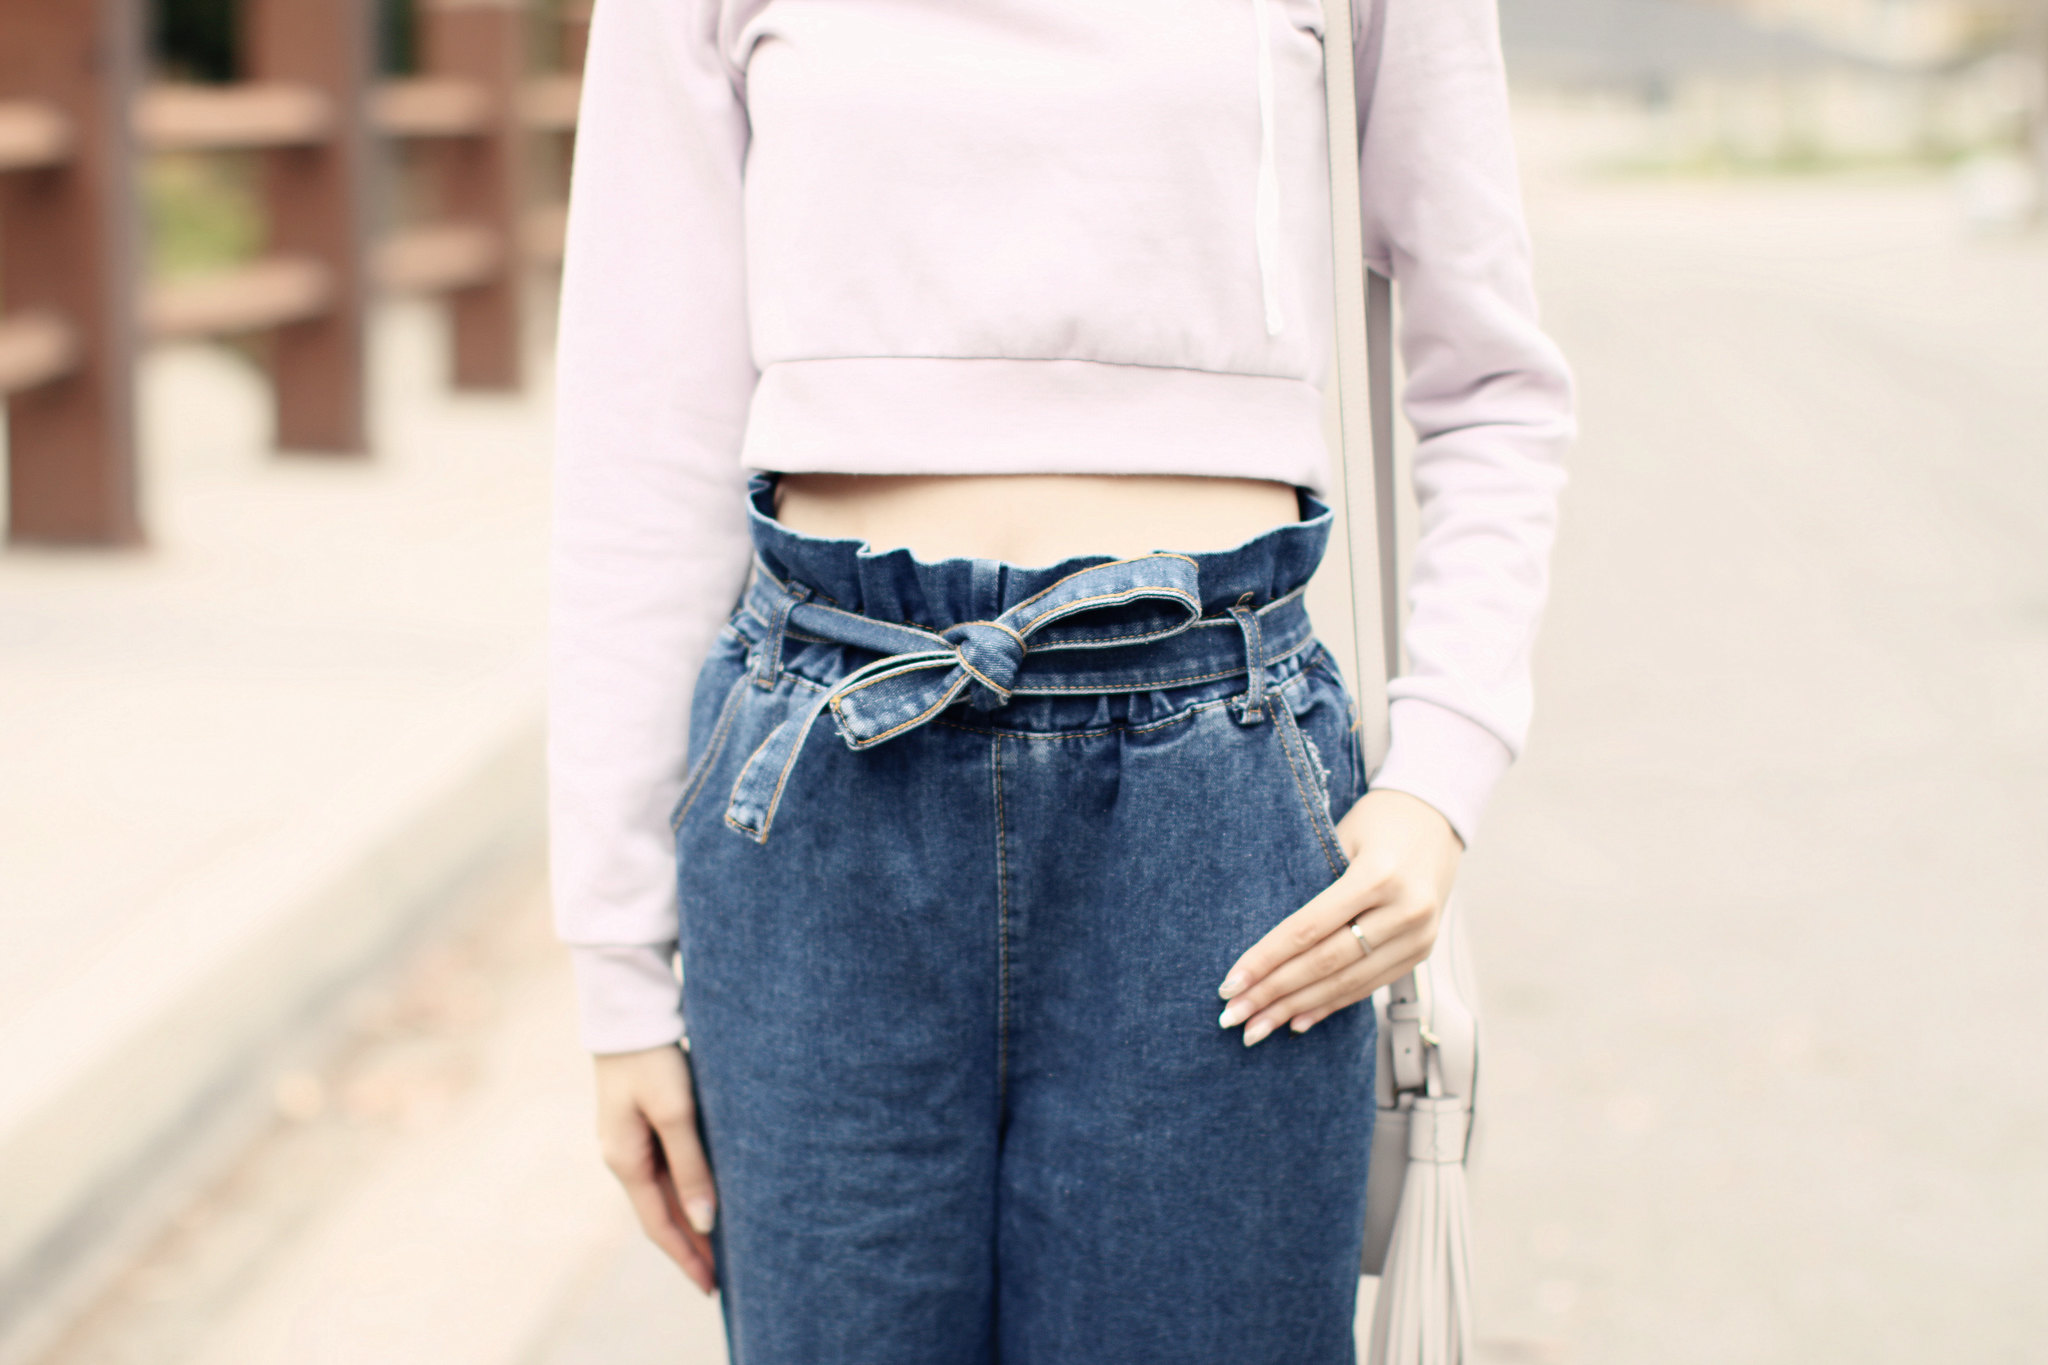 5092-ootd-fashion-style-outfitoftheday-wiwt-streetstyle-zara-f21xme-denim-thrifted-guess-koreanfashion-lookbook-elizabeeetht-clothestoyouuu